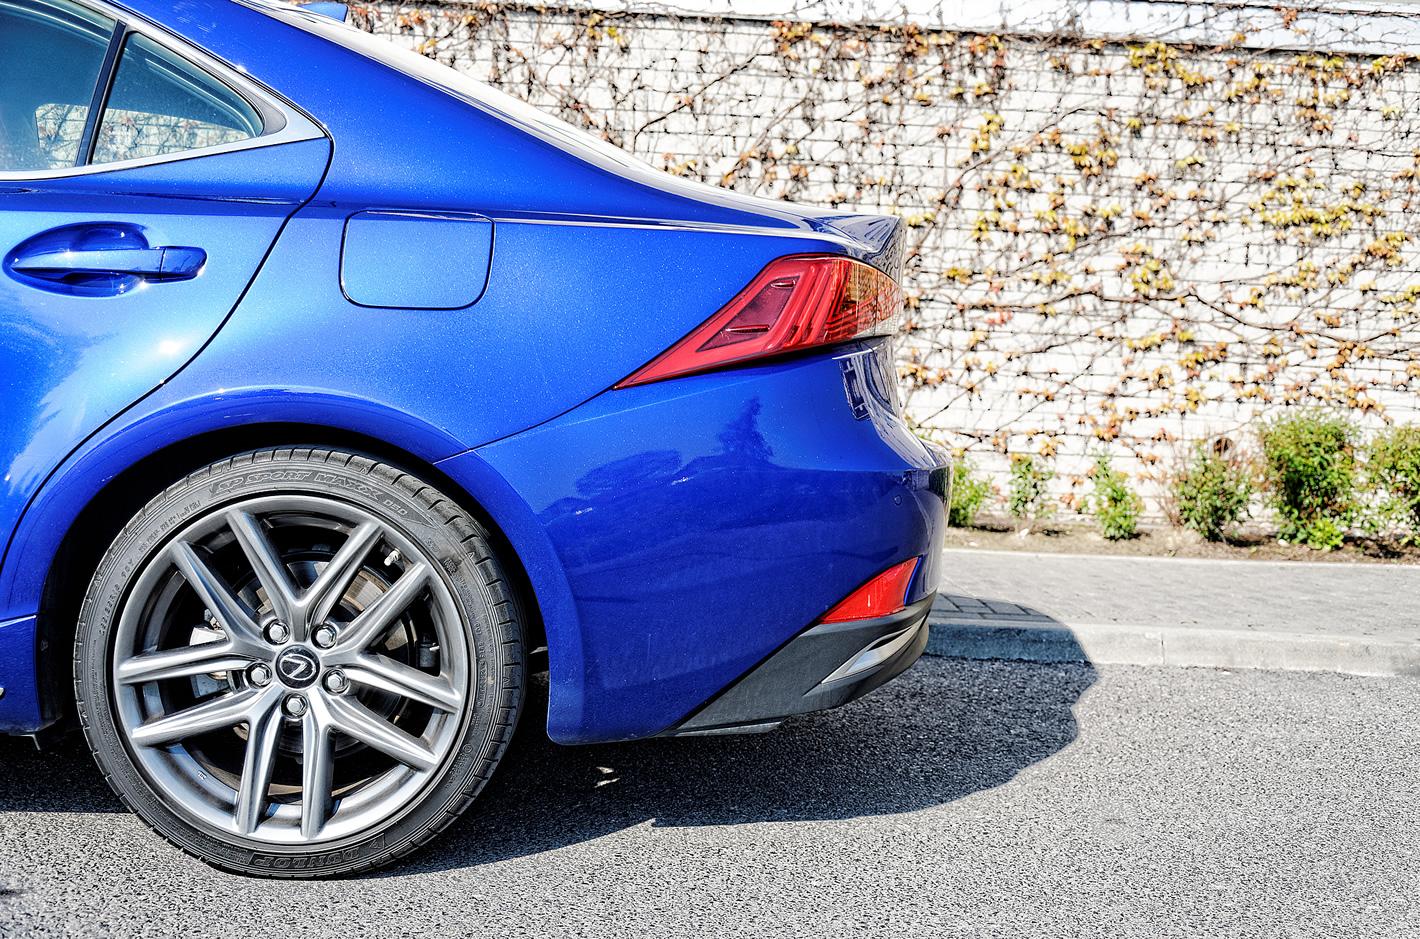 Lexus IS 300h - subtelny spoiler